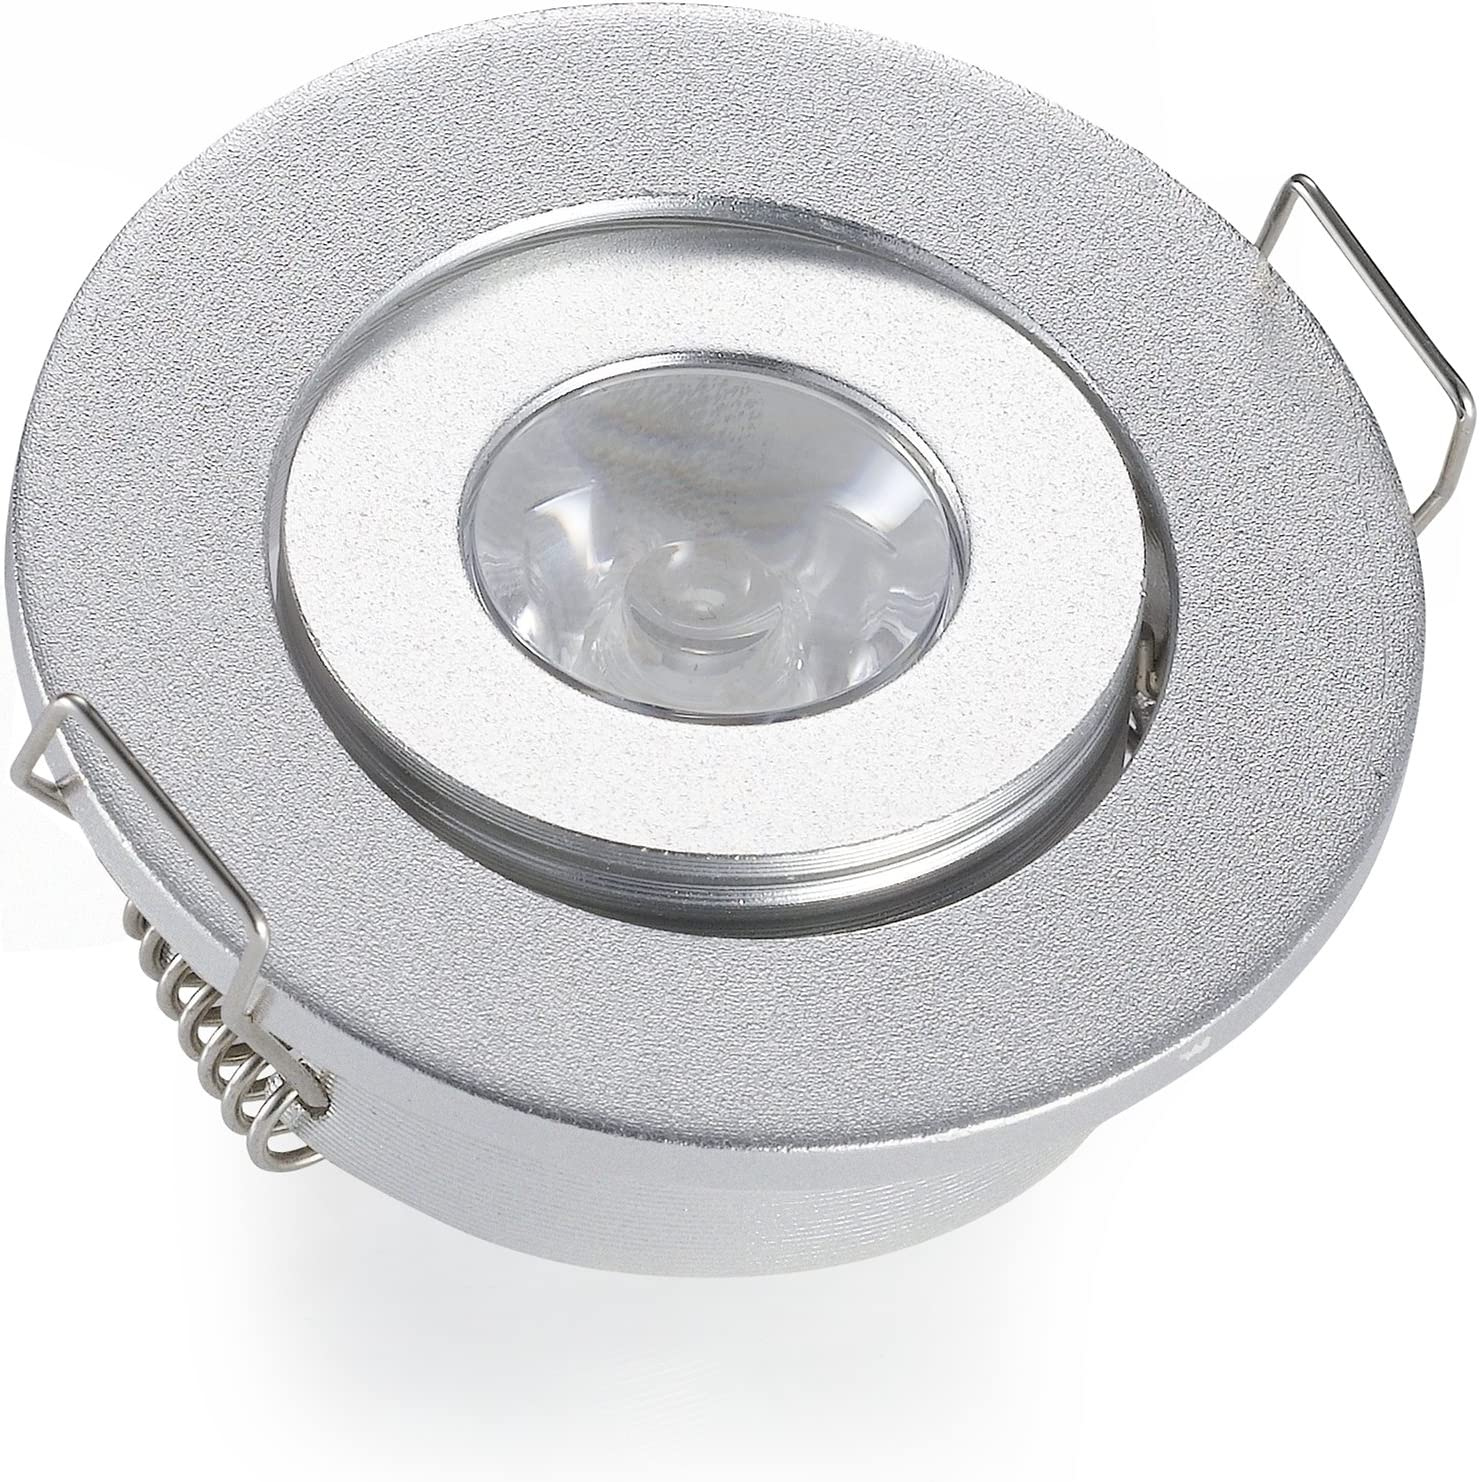 LED Furniture Light Fixture 3W 12V Spotlight Spot Flat Recessed Spotlight Lamp Light